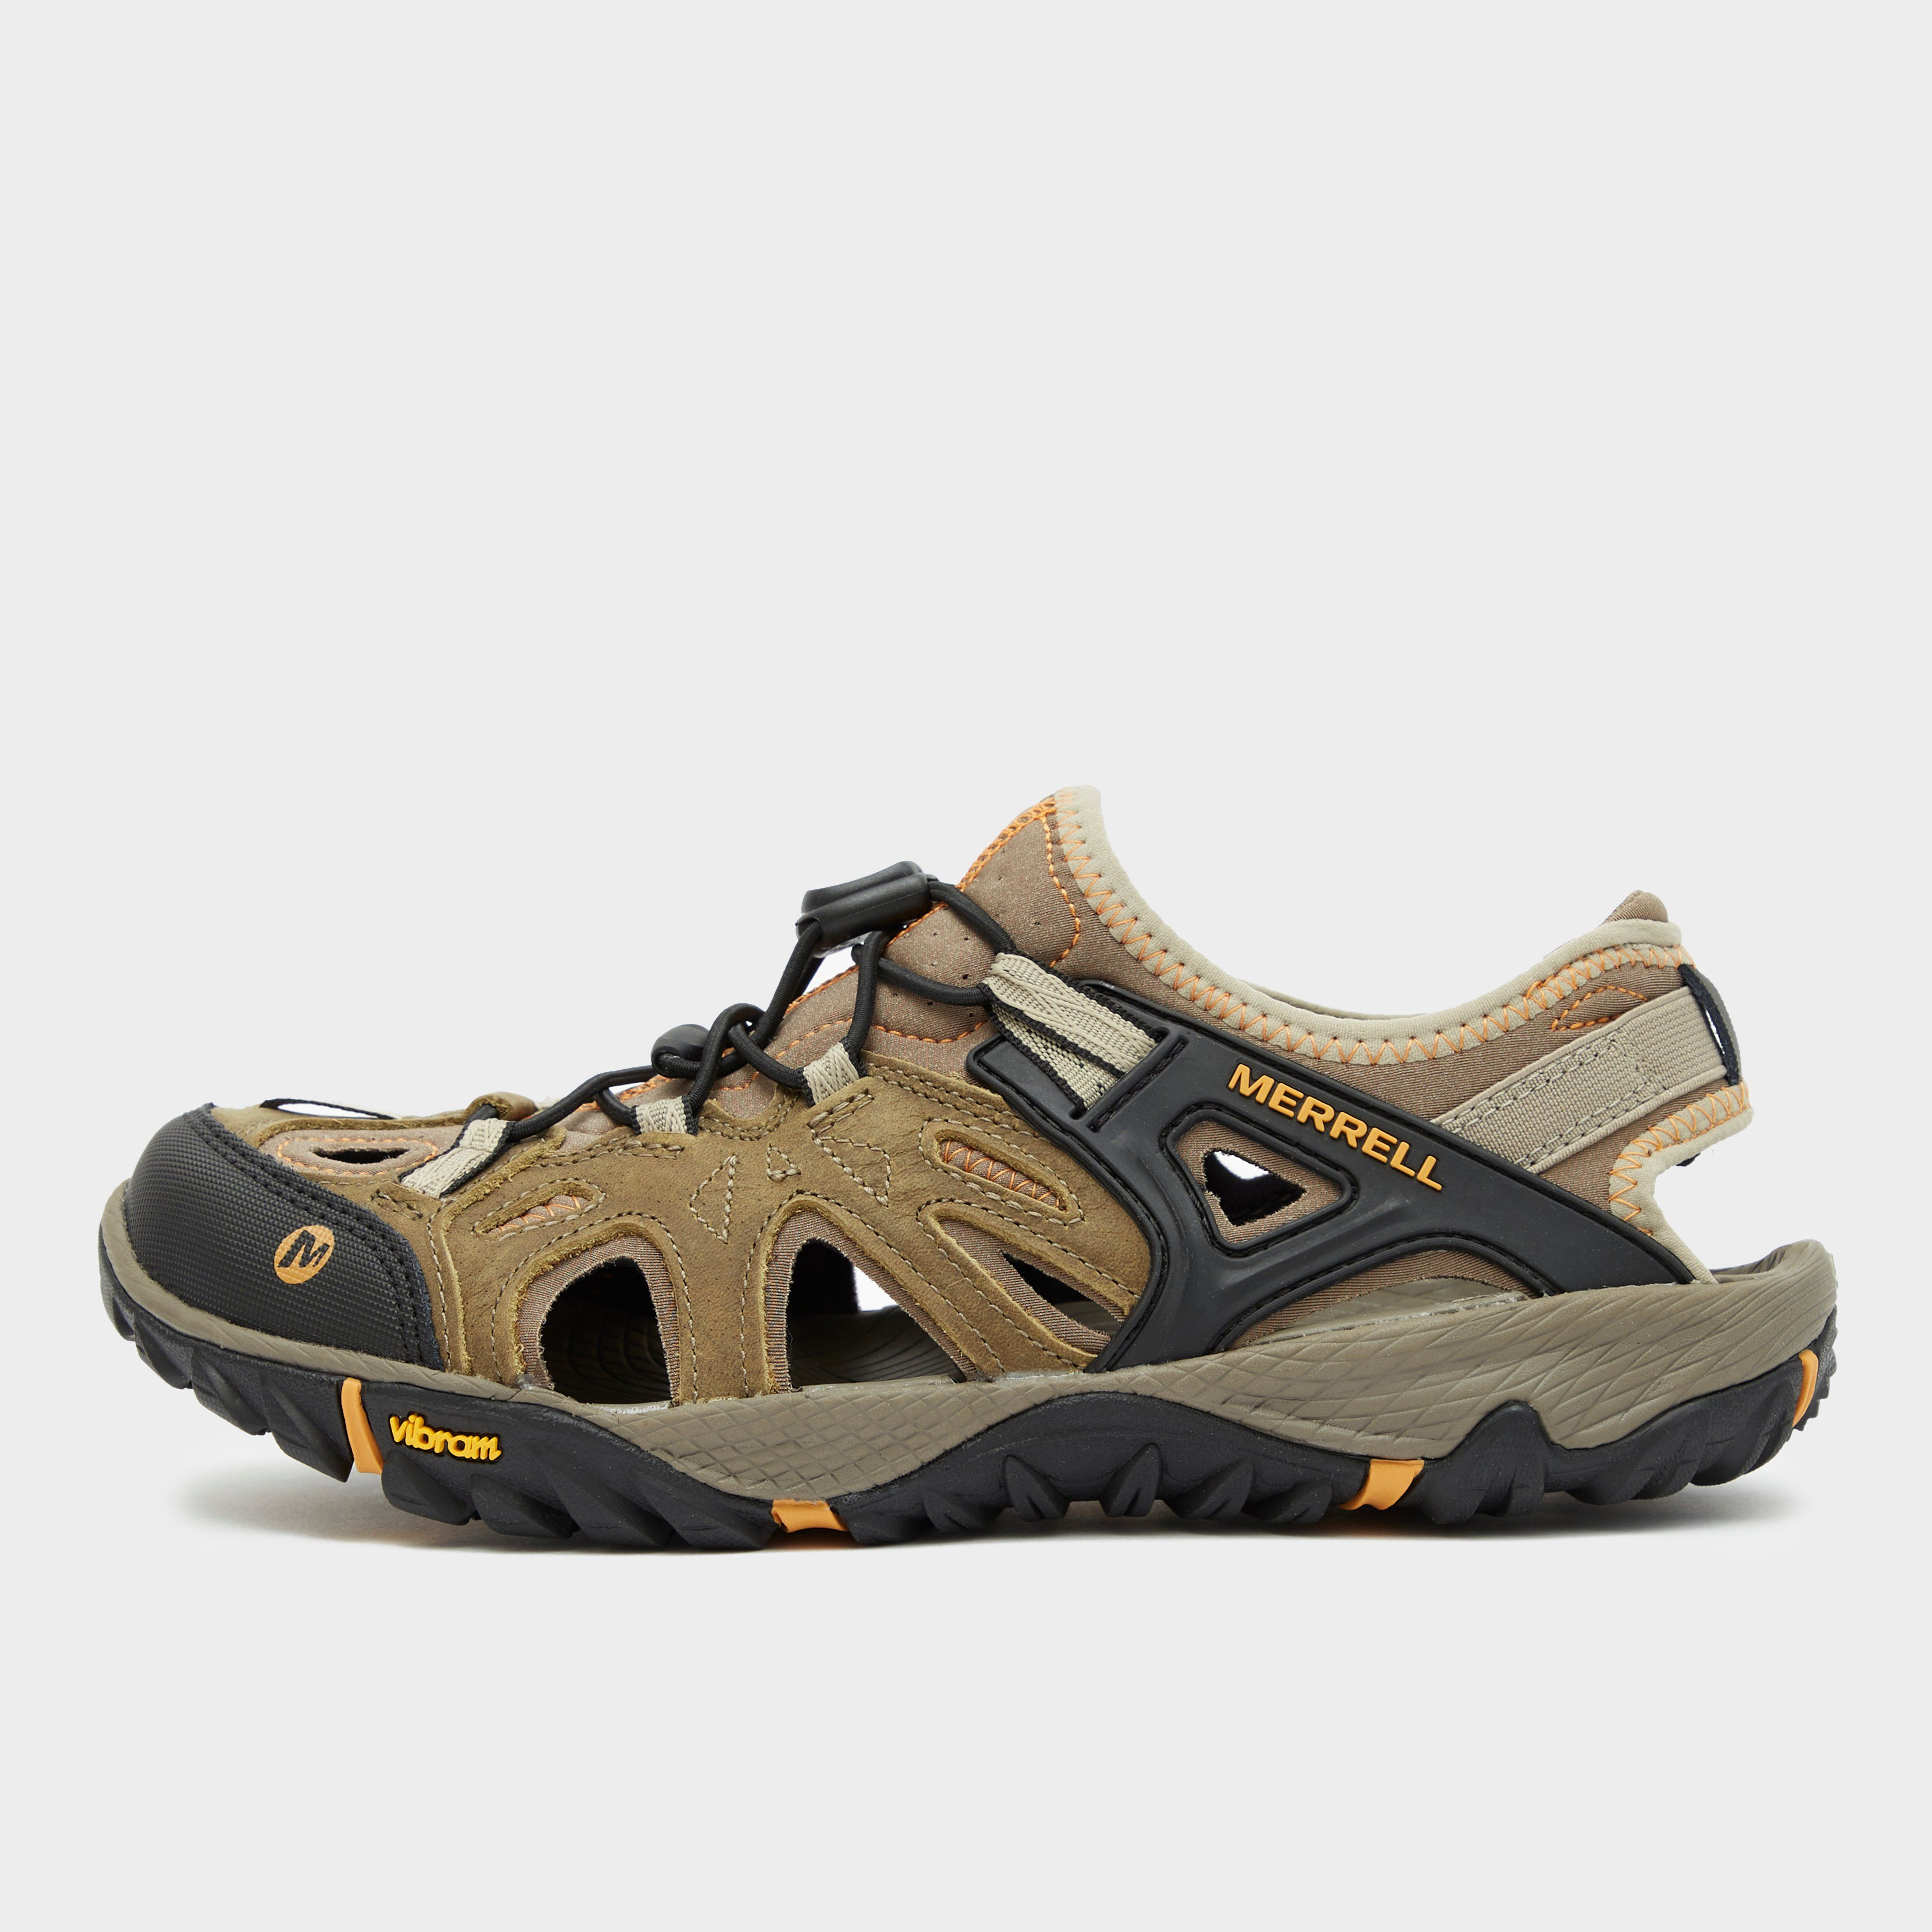 MERRELL Men's Allout Blaze Sieve Shoe